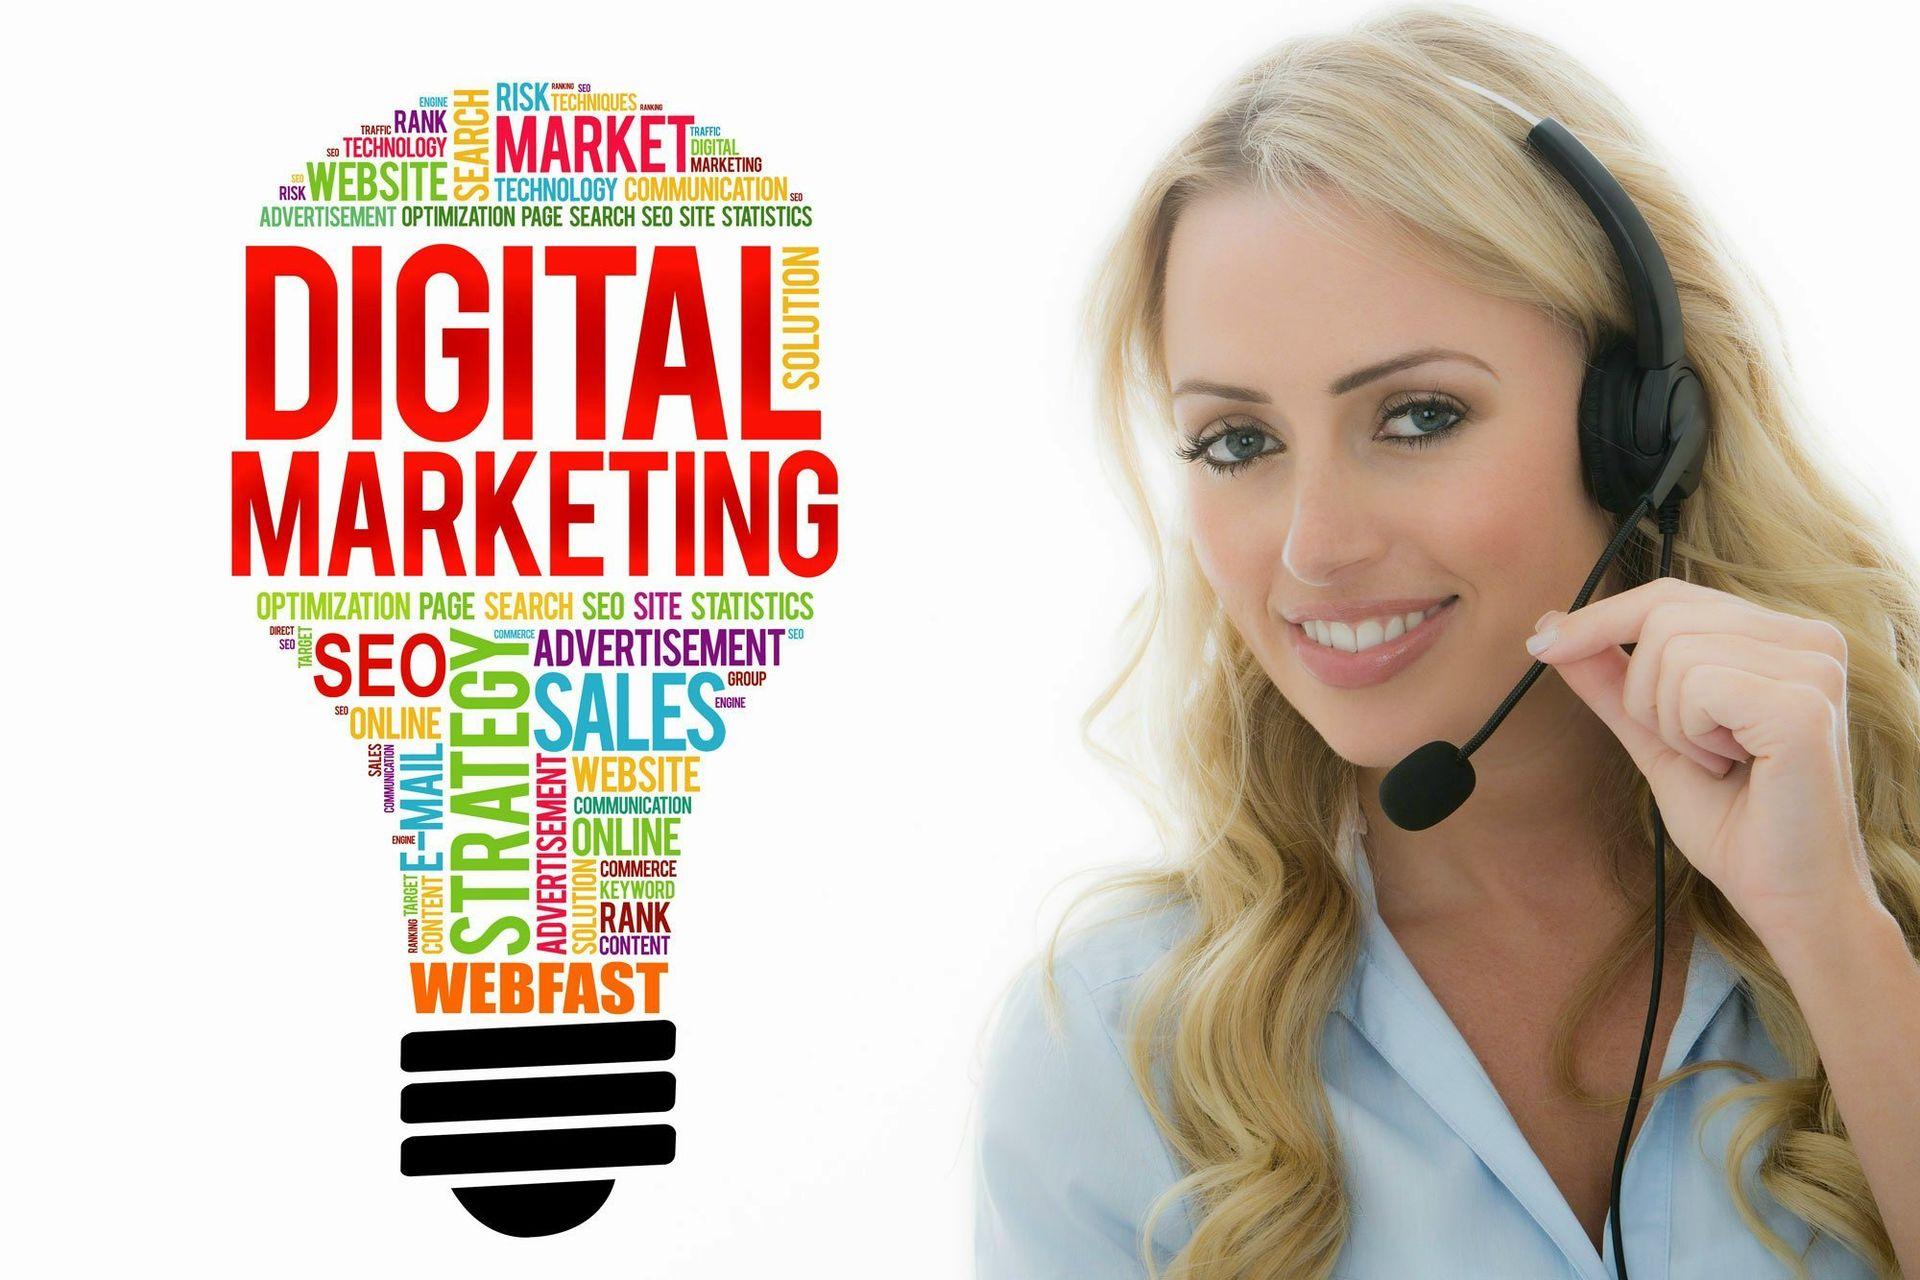 digital-marketing-agency-highly-recommended-digital-marketing